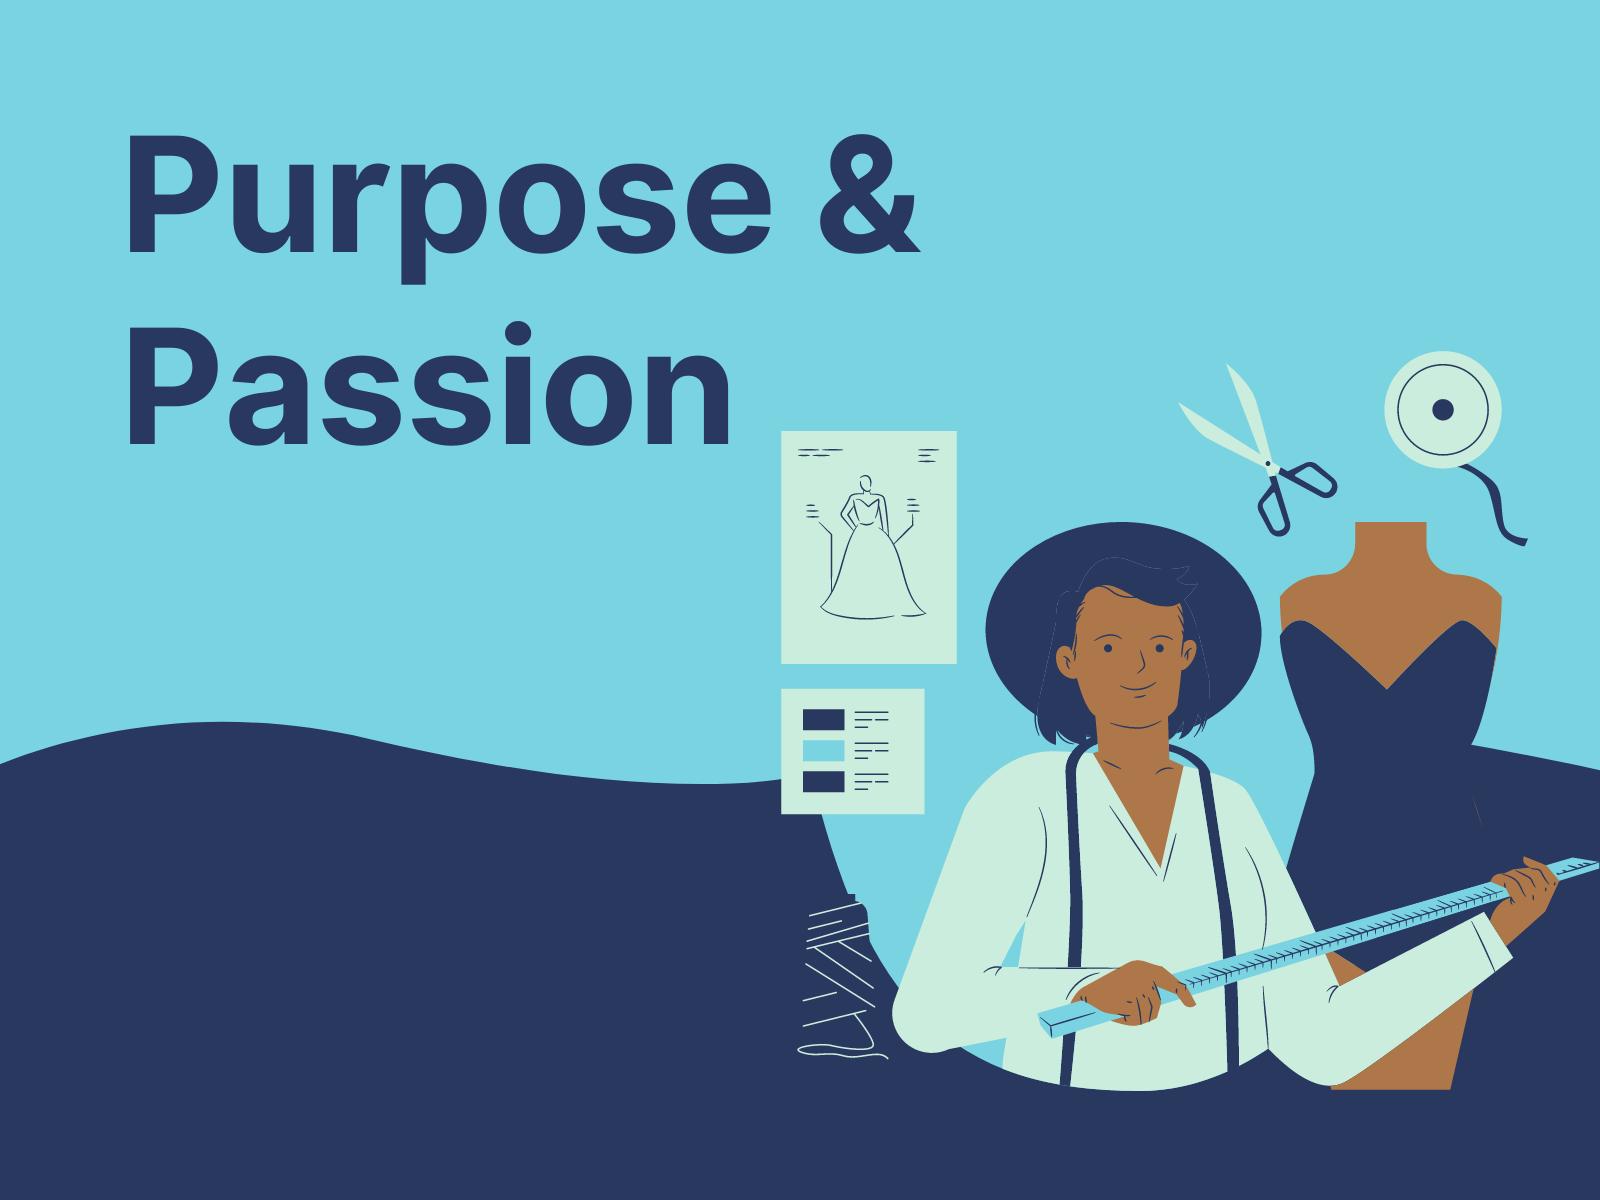 Purpose & Passion